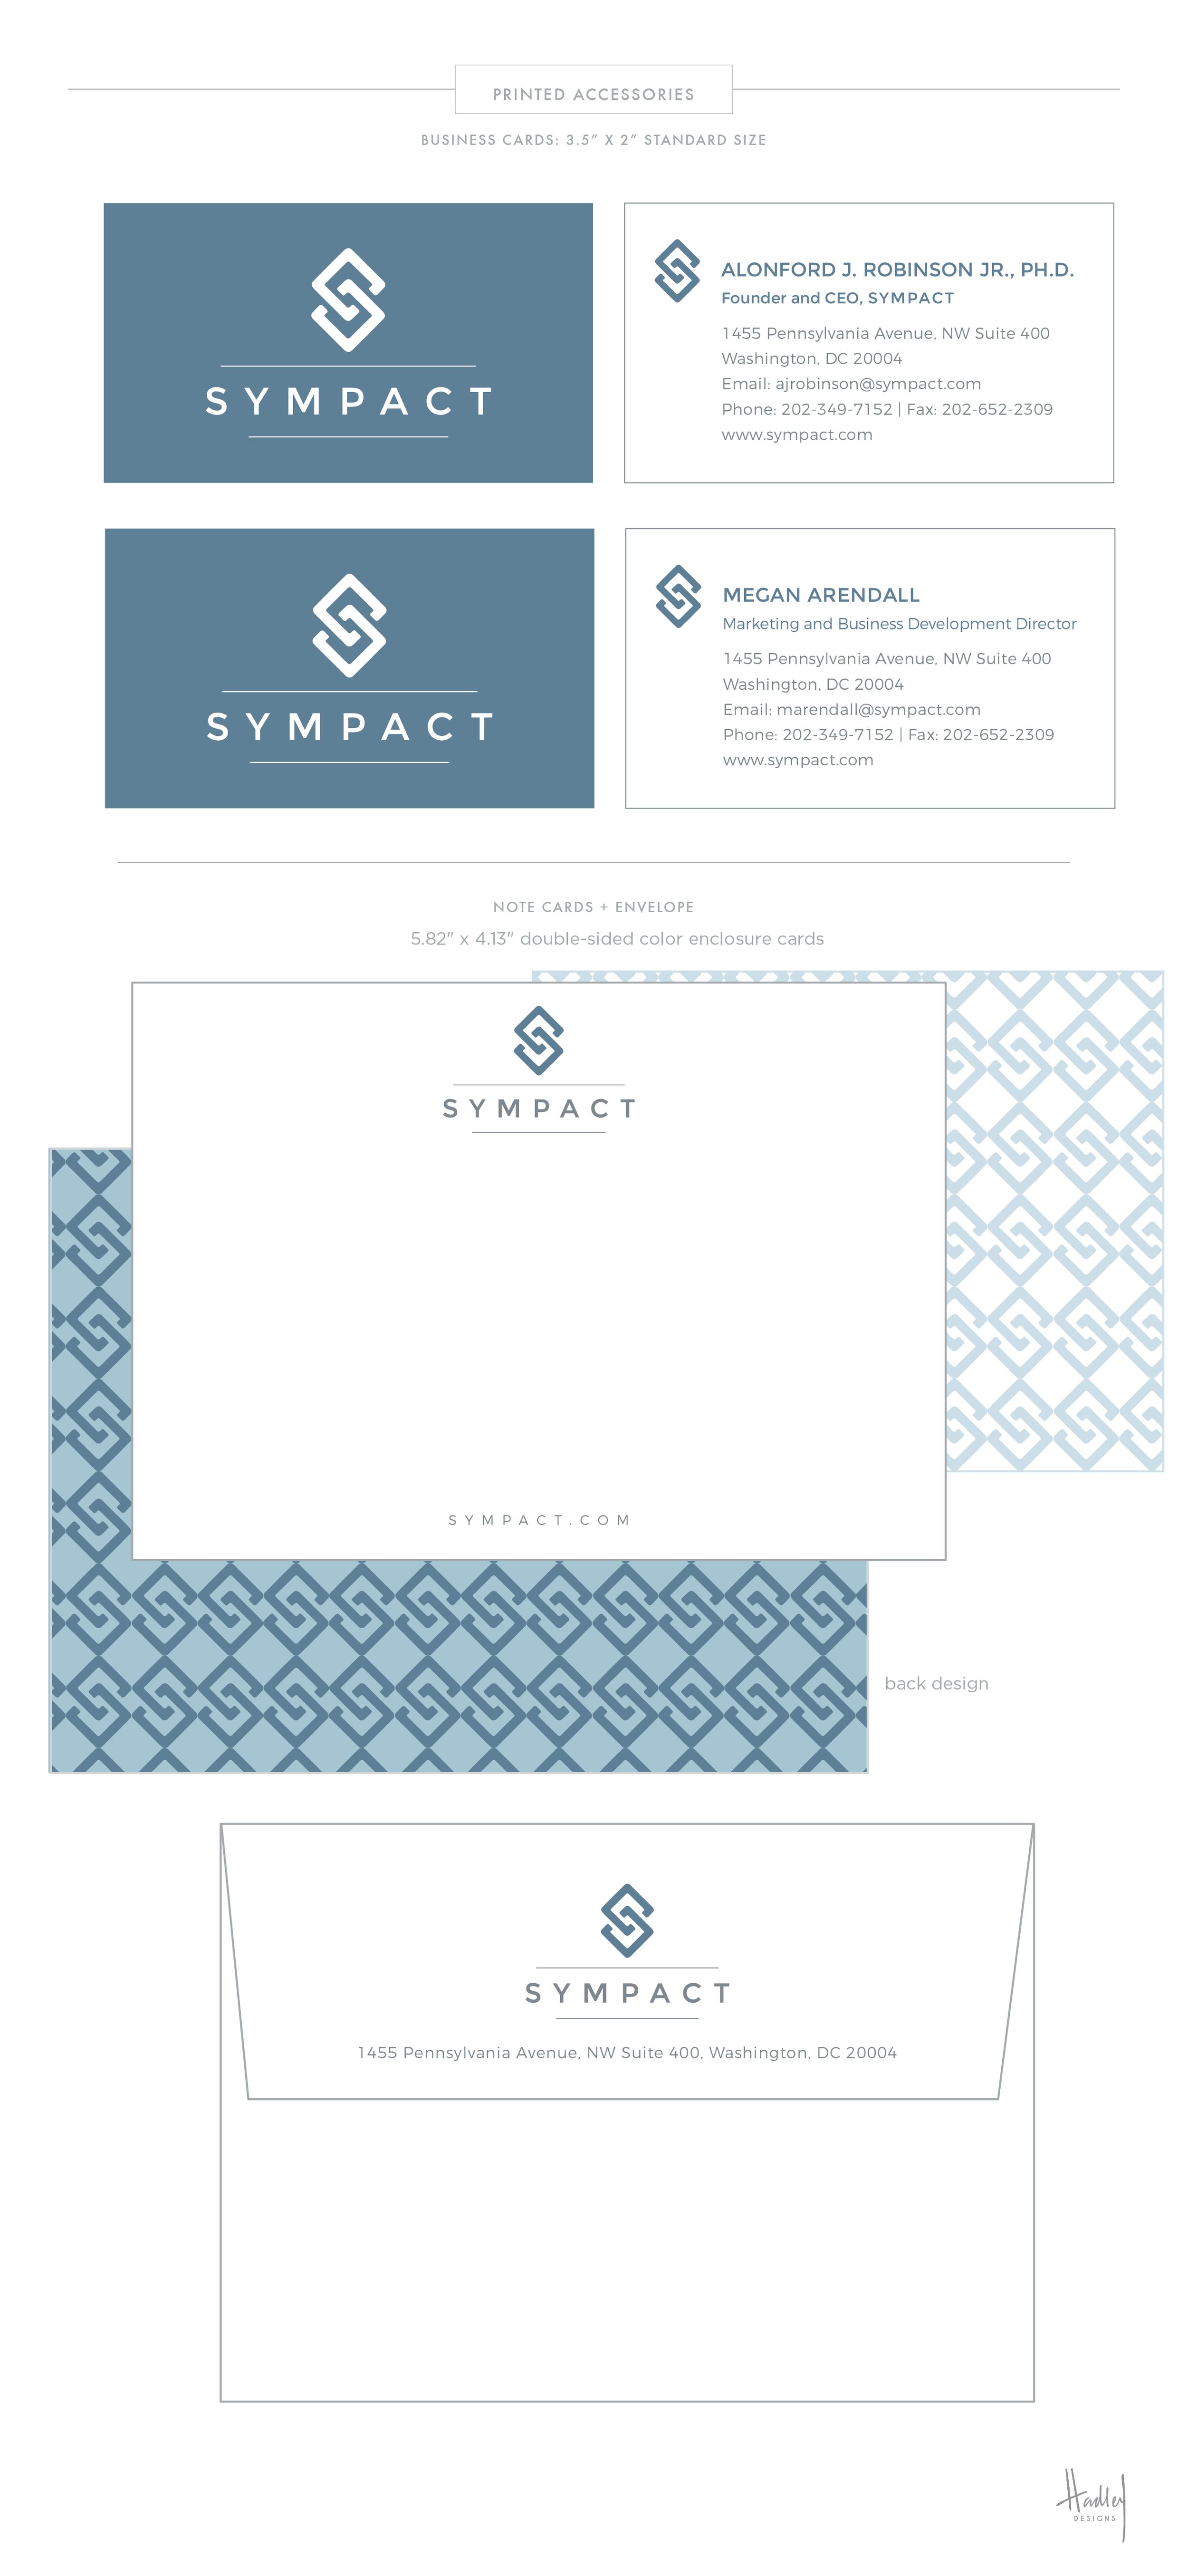 SYMPACT_stationery_v1.png